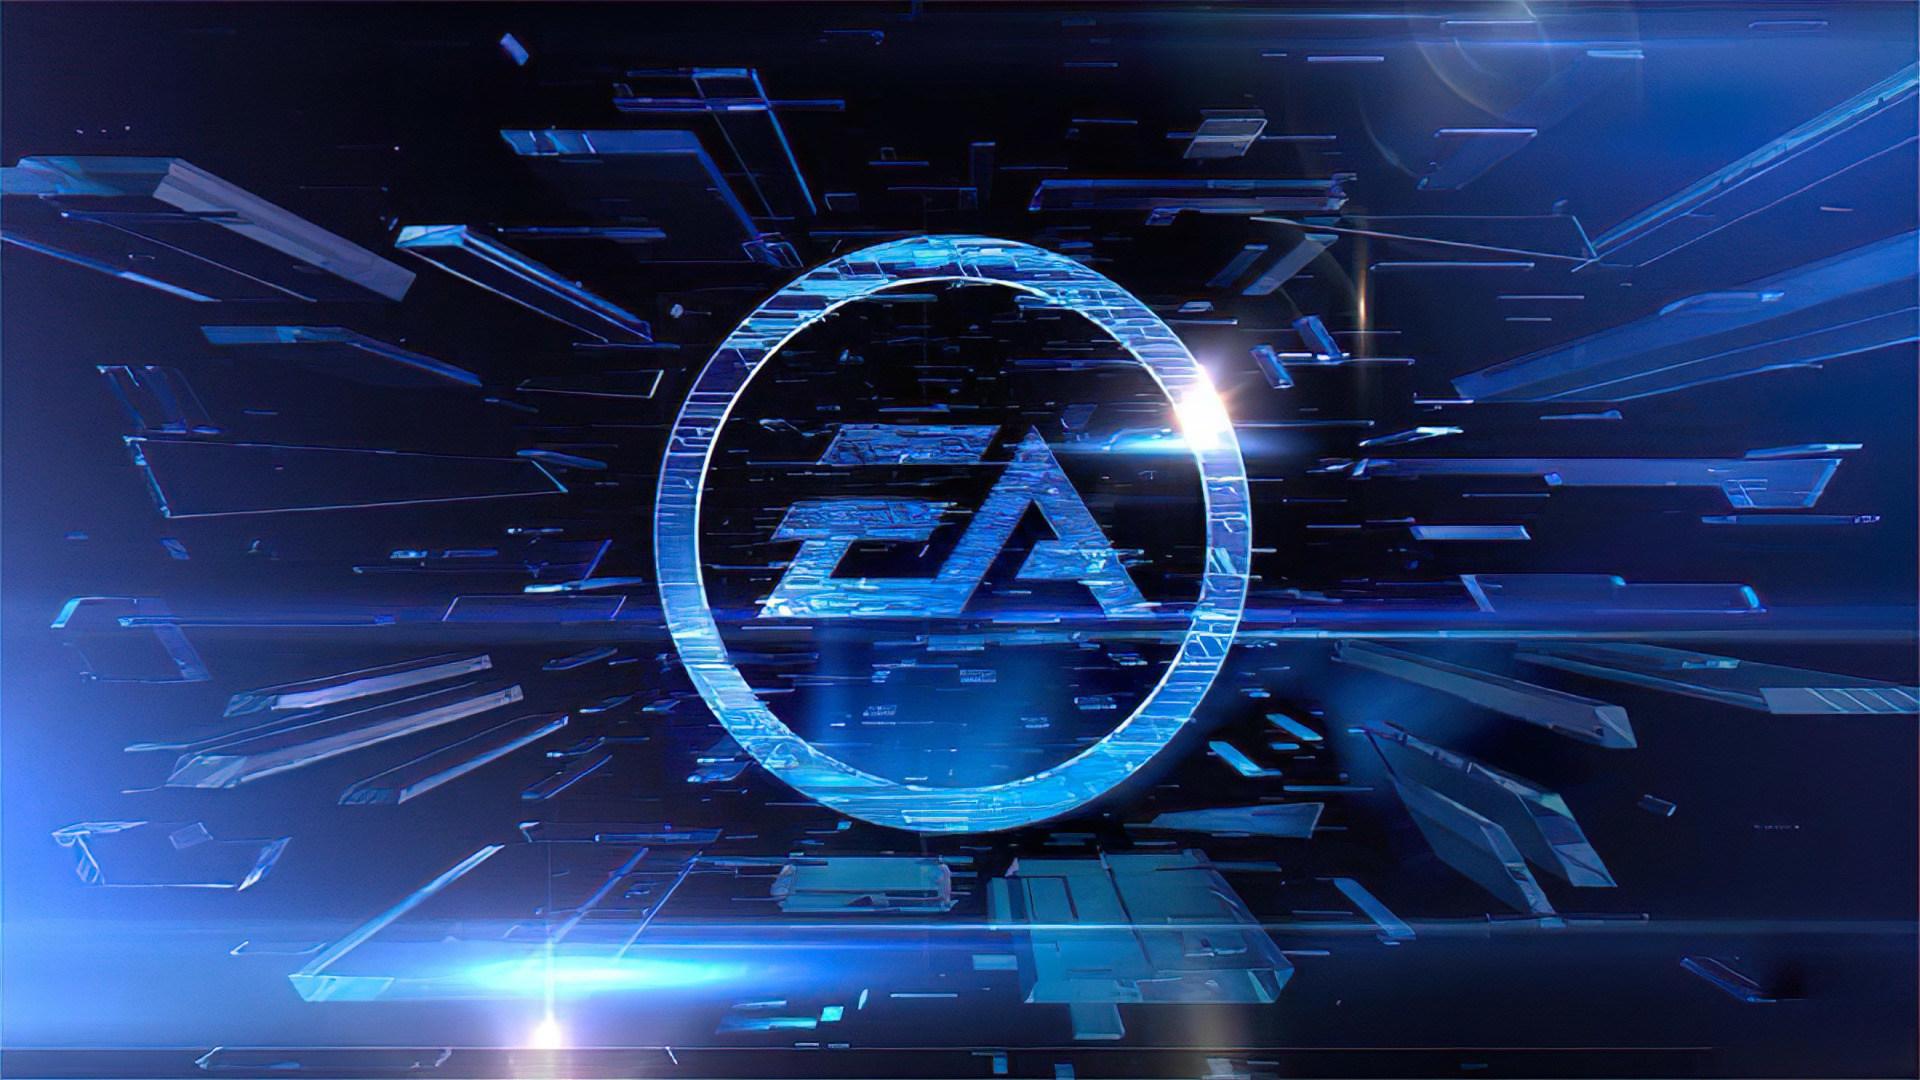 Trailer, Electronic Arts, Ea, Ego-Shooter, E3, Shooter, actionspiel, Online-Spiele, Online-Shooter, Dice, Battlefield, EA Sports, Premiere, Online-Multiplayer, Battlefield 6, Battlefield 2042, BF2042, BF6